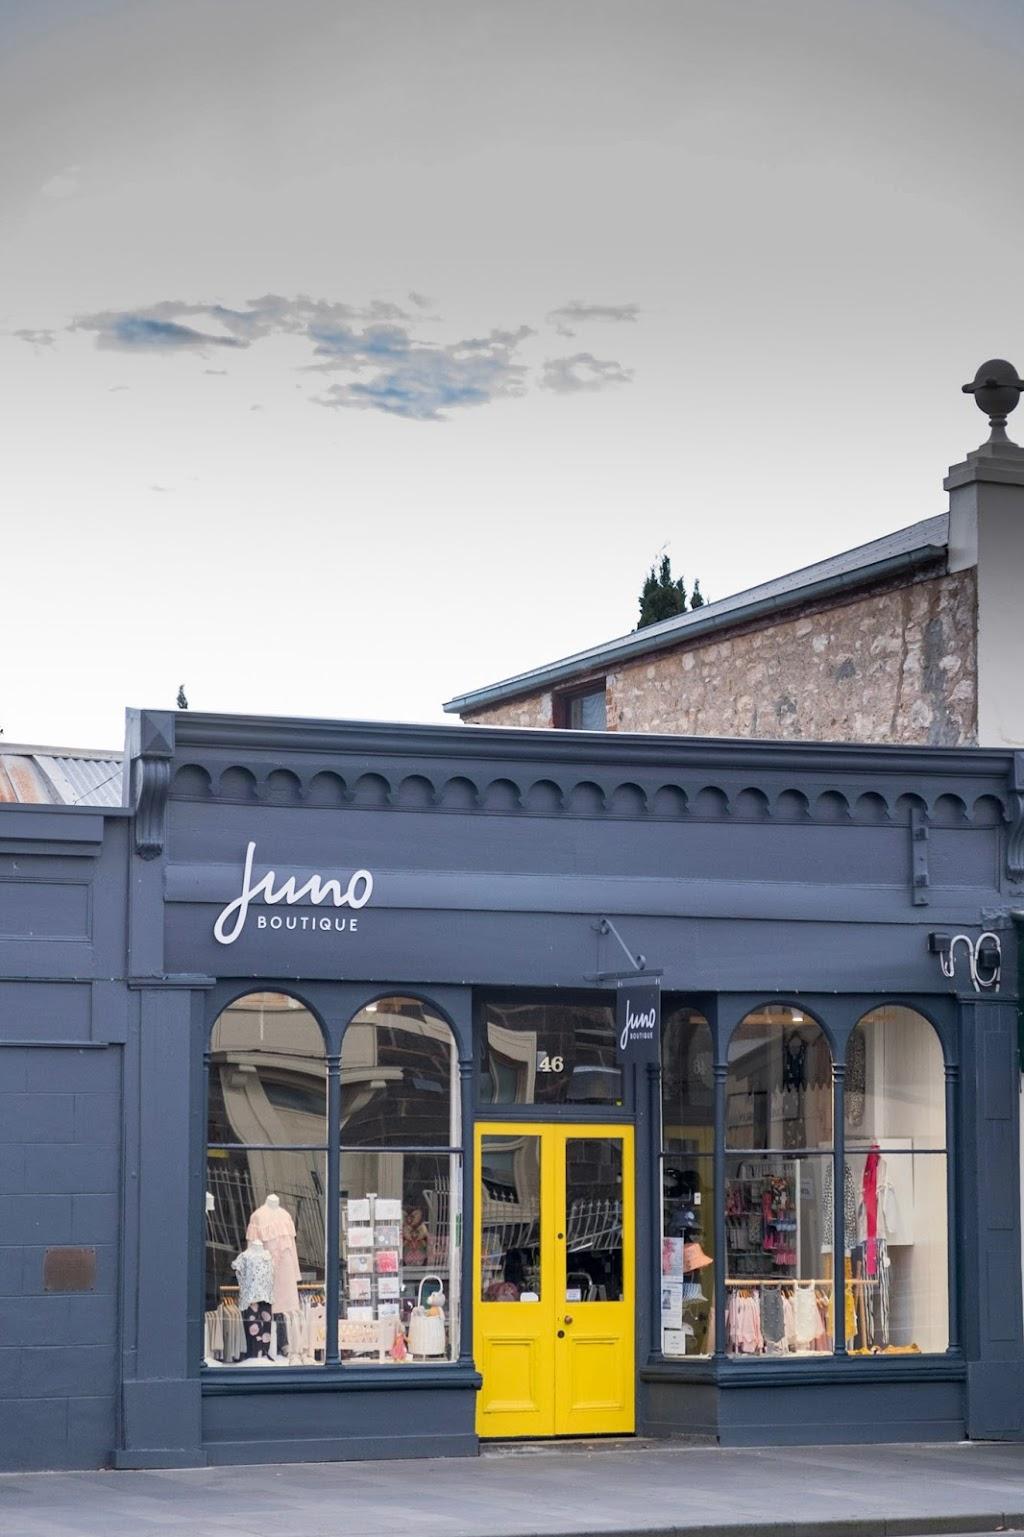 JUNO Boutique | clothing store | 46 Sackville St, Port Fairy VIC 3284, Australia | 0355681997 OR +61 3 5568 1997